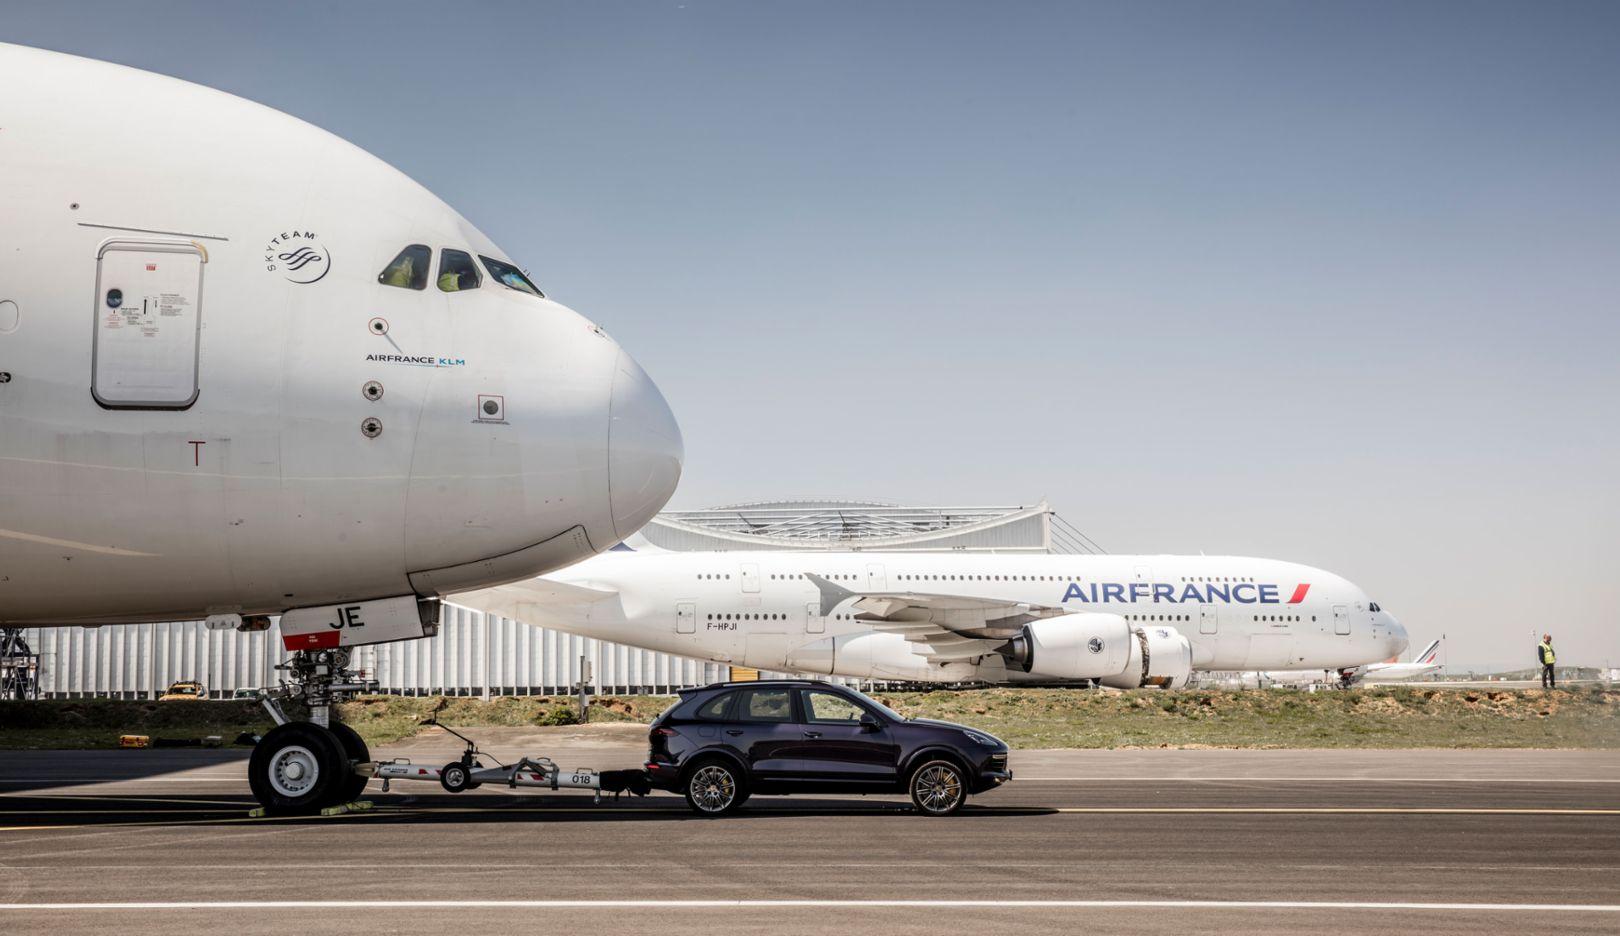 Cayenne S Diesel, Air France A 380, Paris Charles de Gaulle Airport, 2017, Porsche AG